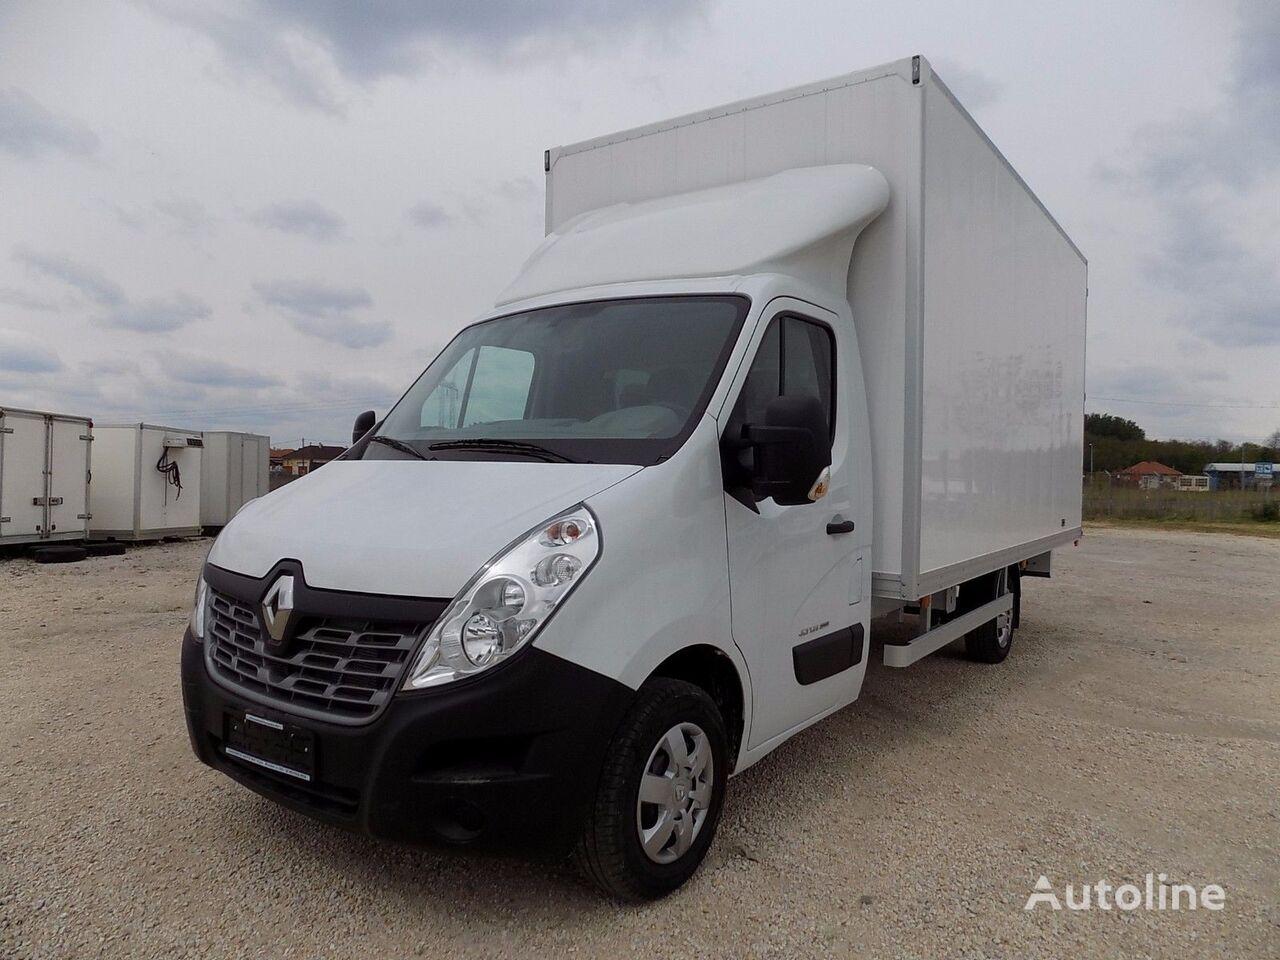 VOLKSWAGEN Crafter XLH2, 15,6m3, 136Ps autoutilitară furgon nouă